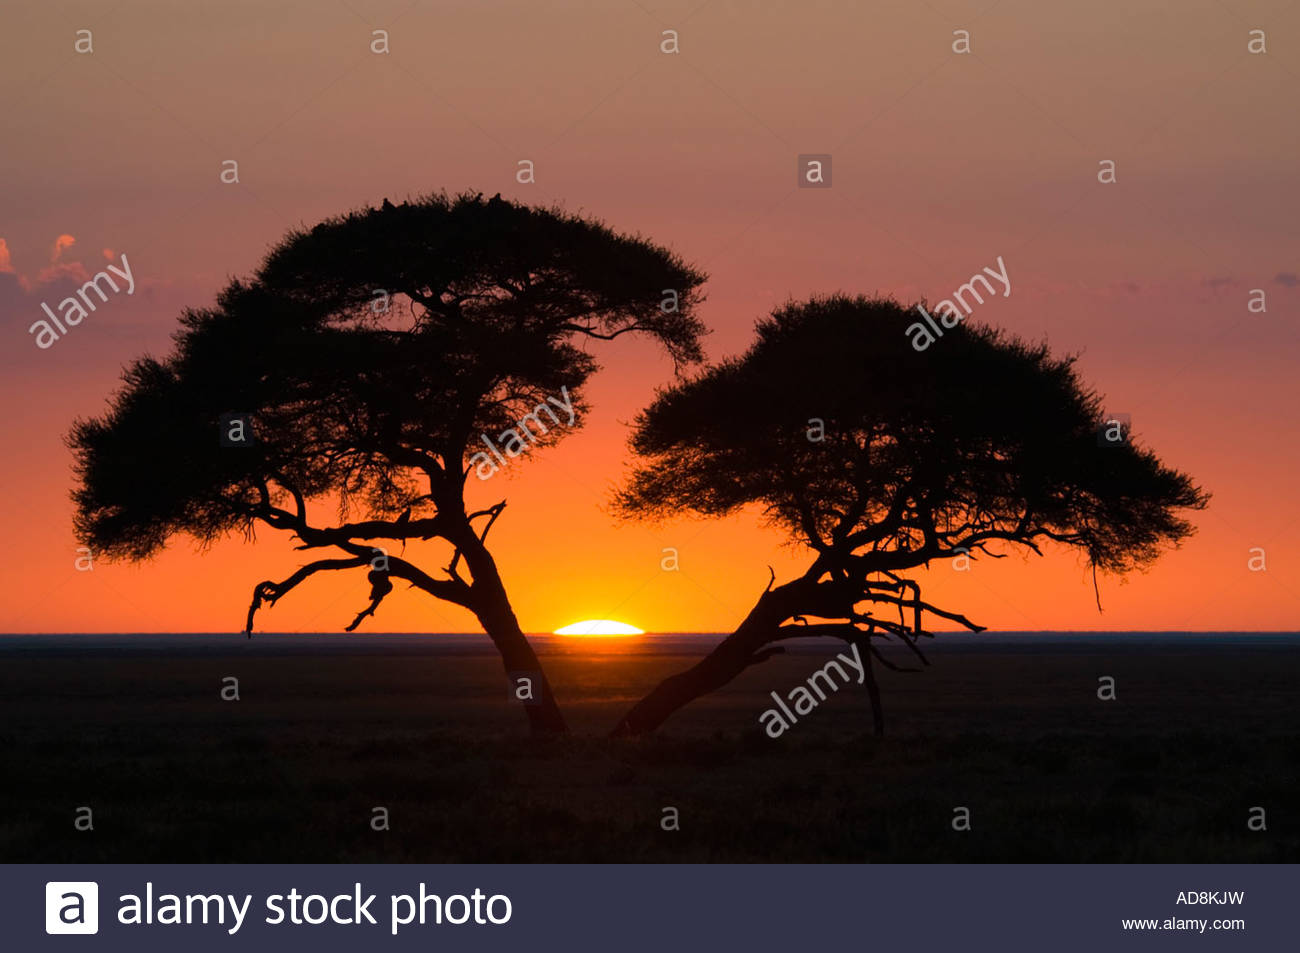 Amanecer africano con árboles de acacia en silueta. El Parque Nacional de Etosha, Namibia, África Imagen De Stock